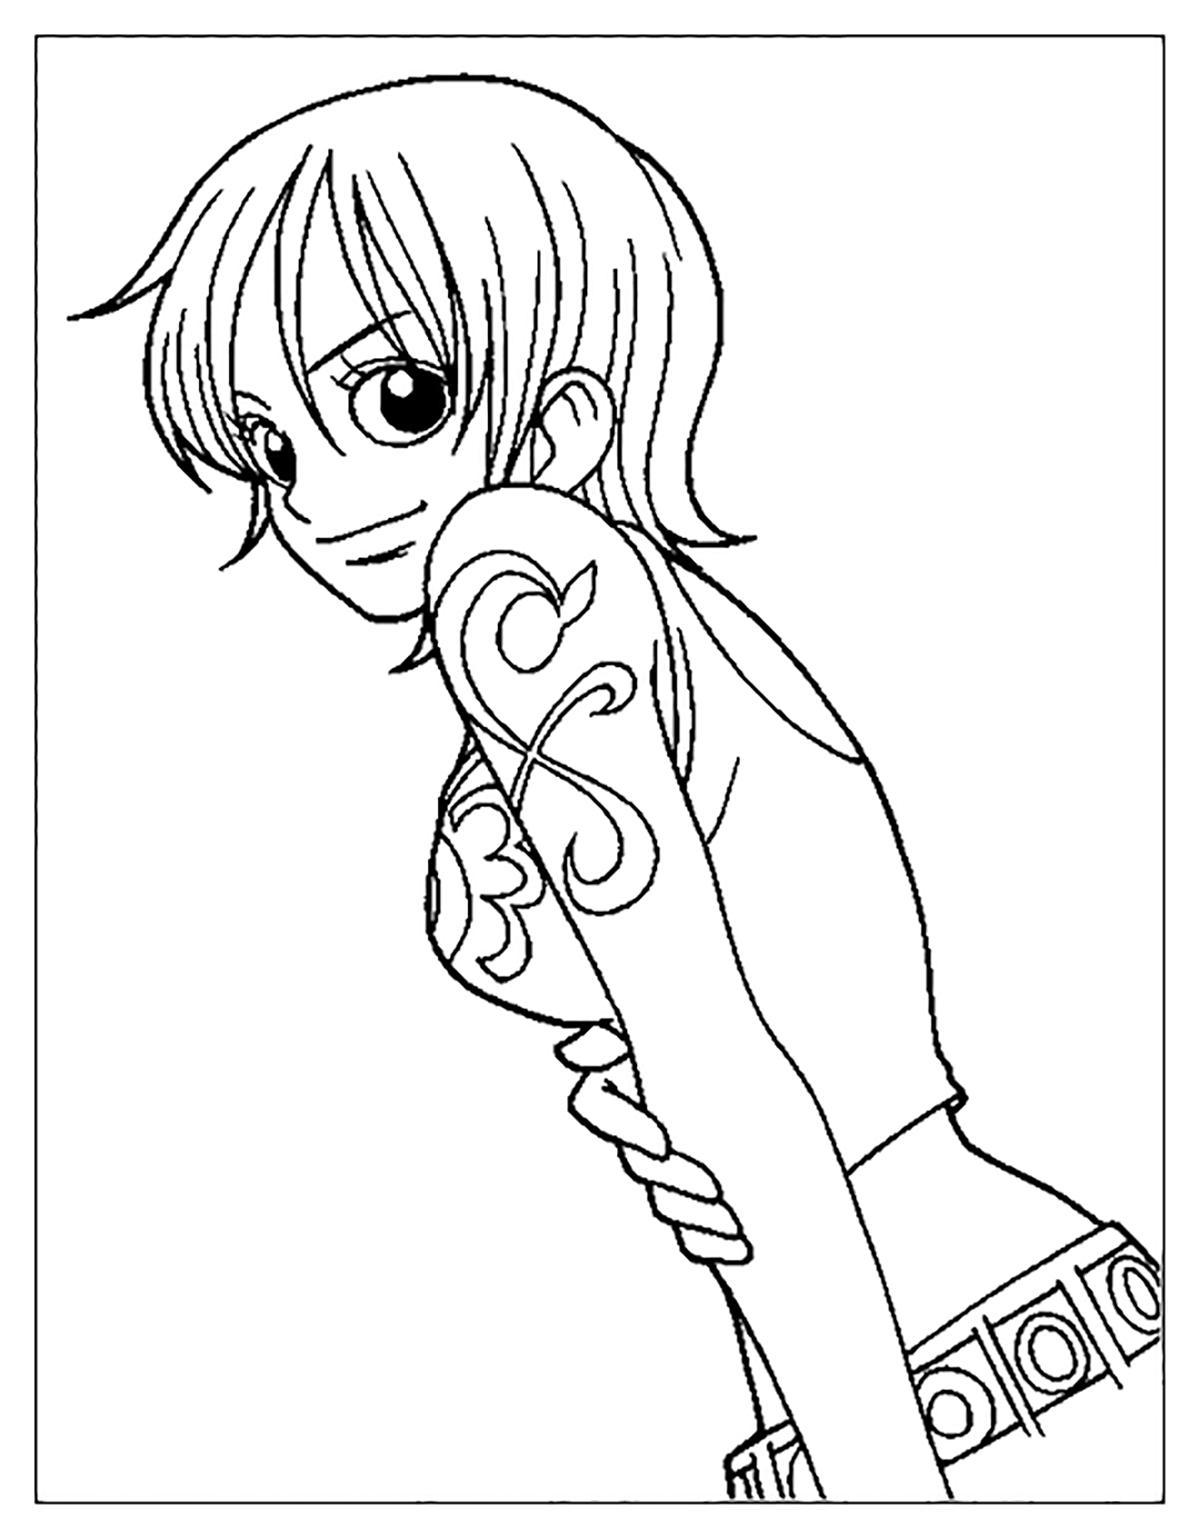 Coloriage De One Piece A Imprimer Coloriage One Piece